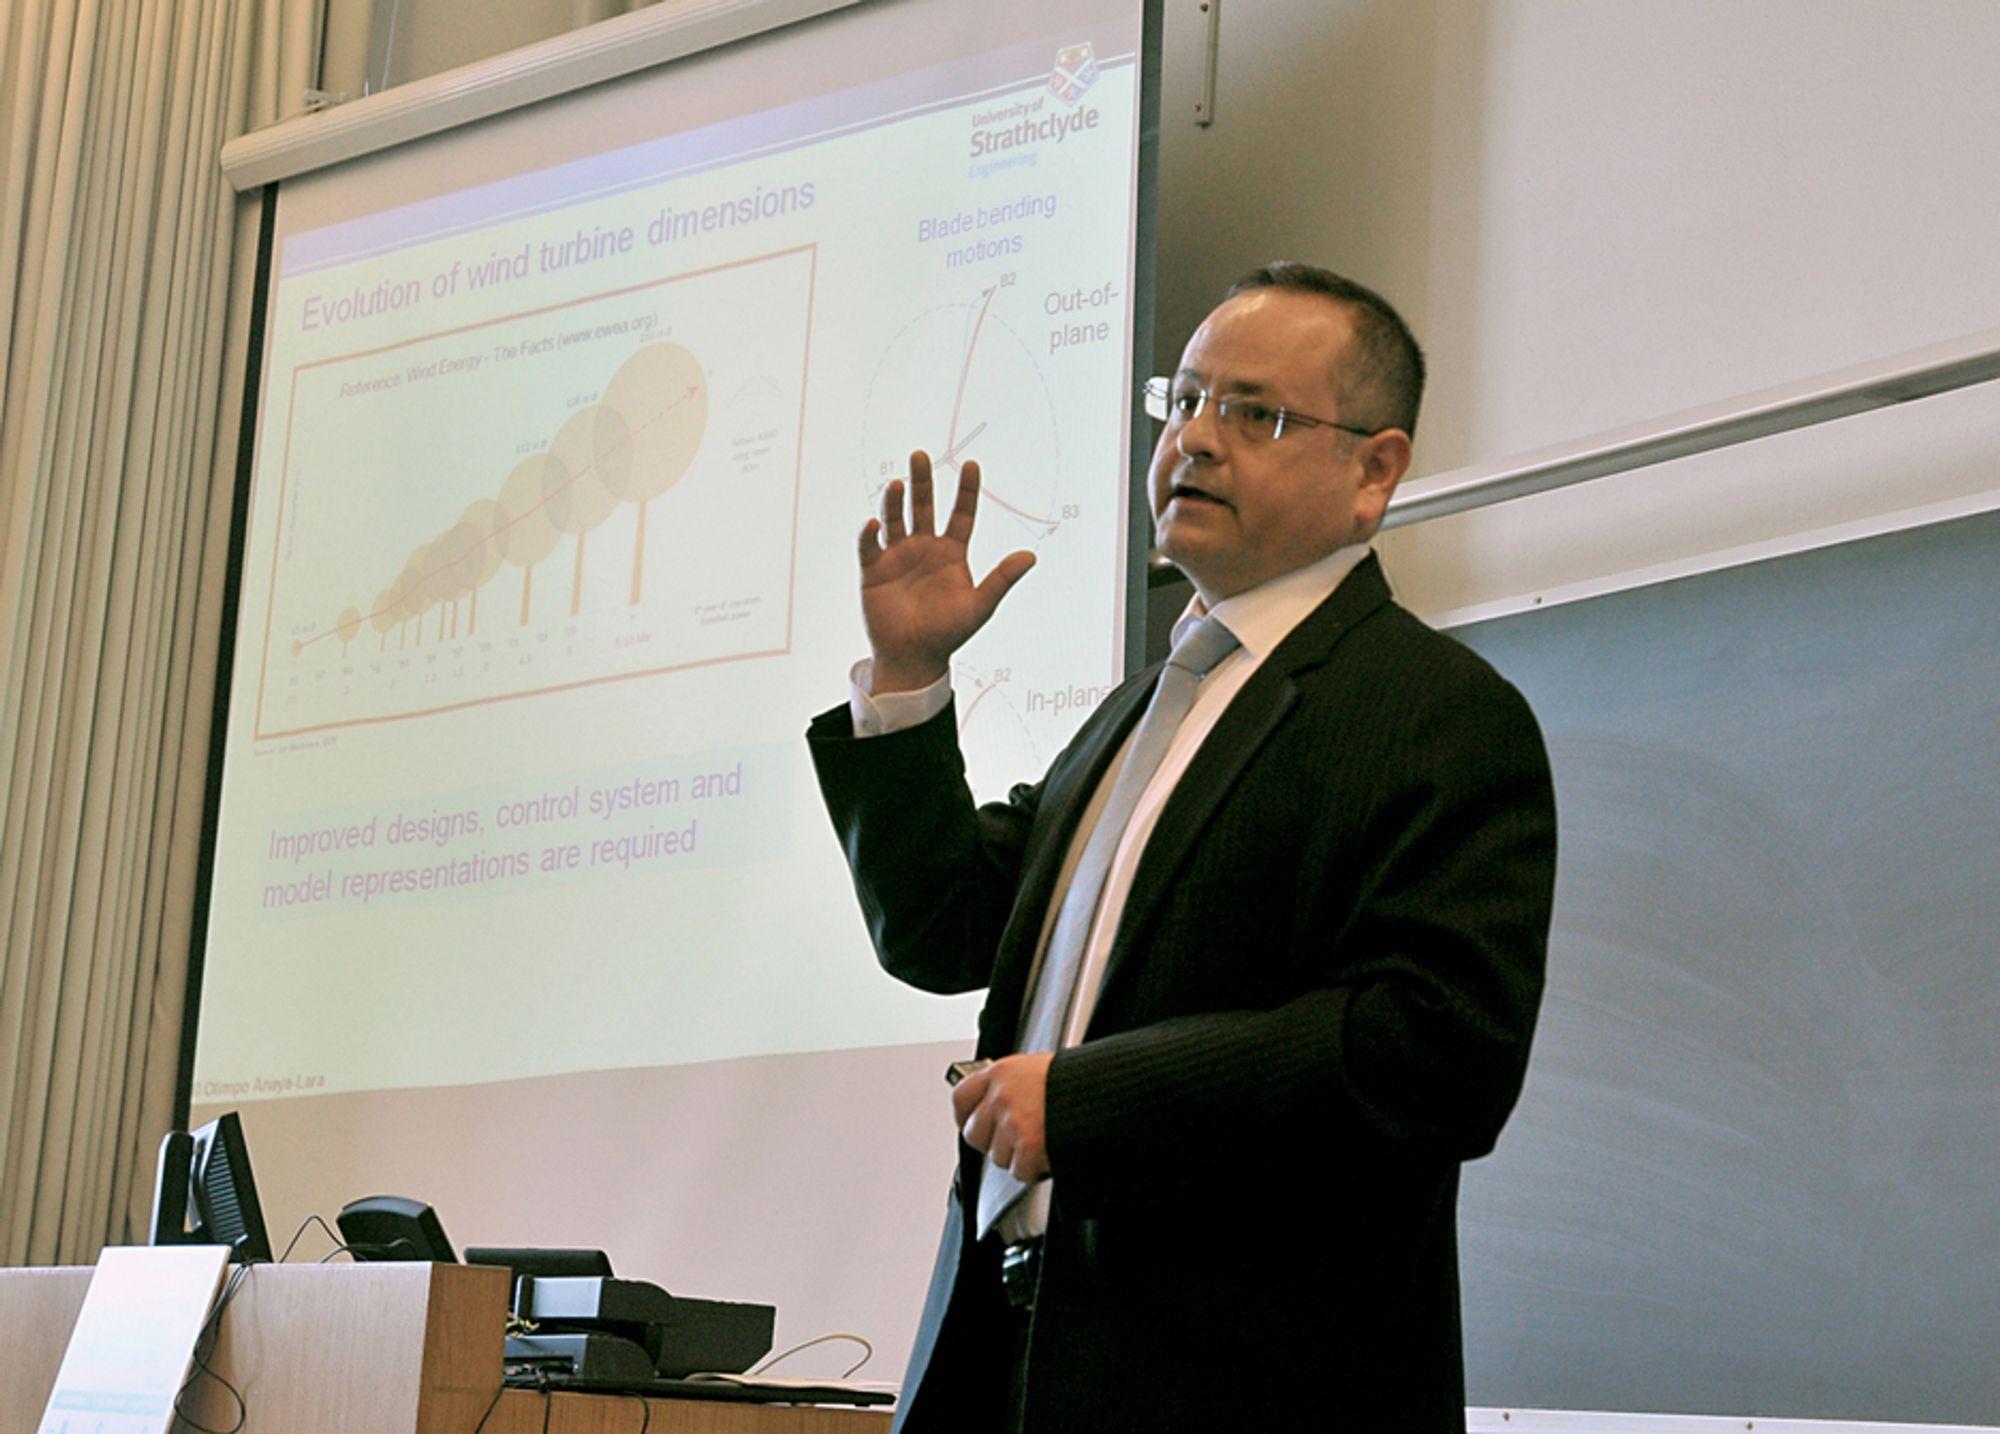 EKSPERTGAVE: Professor Olimpo Anaya-Lara fra University of Strathclyde i Skotland skal være gjesteprofessor ved NTNU.